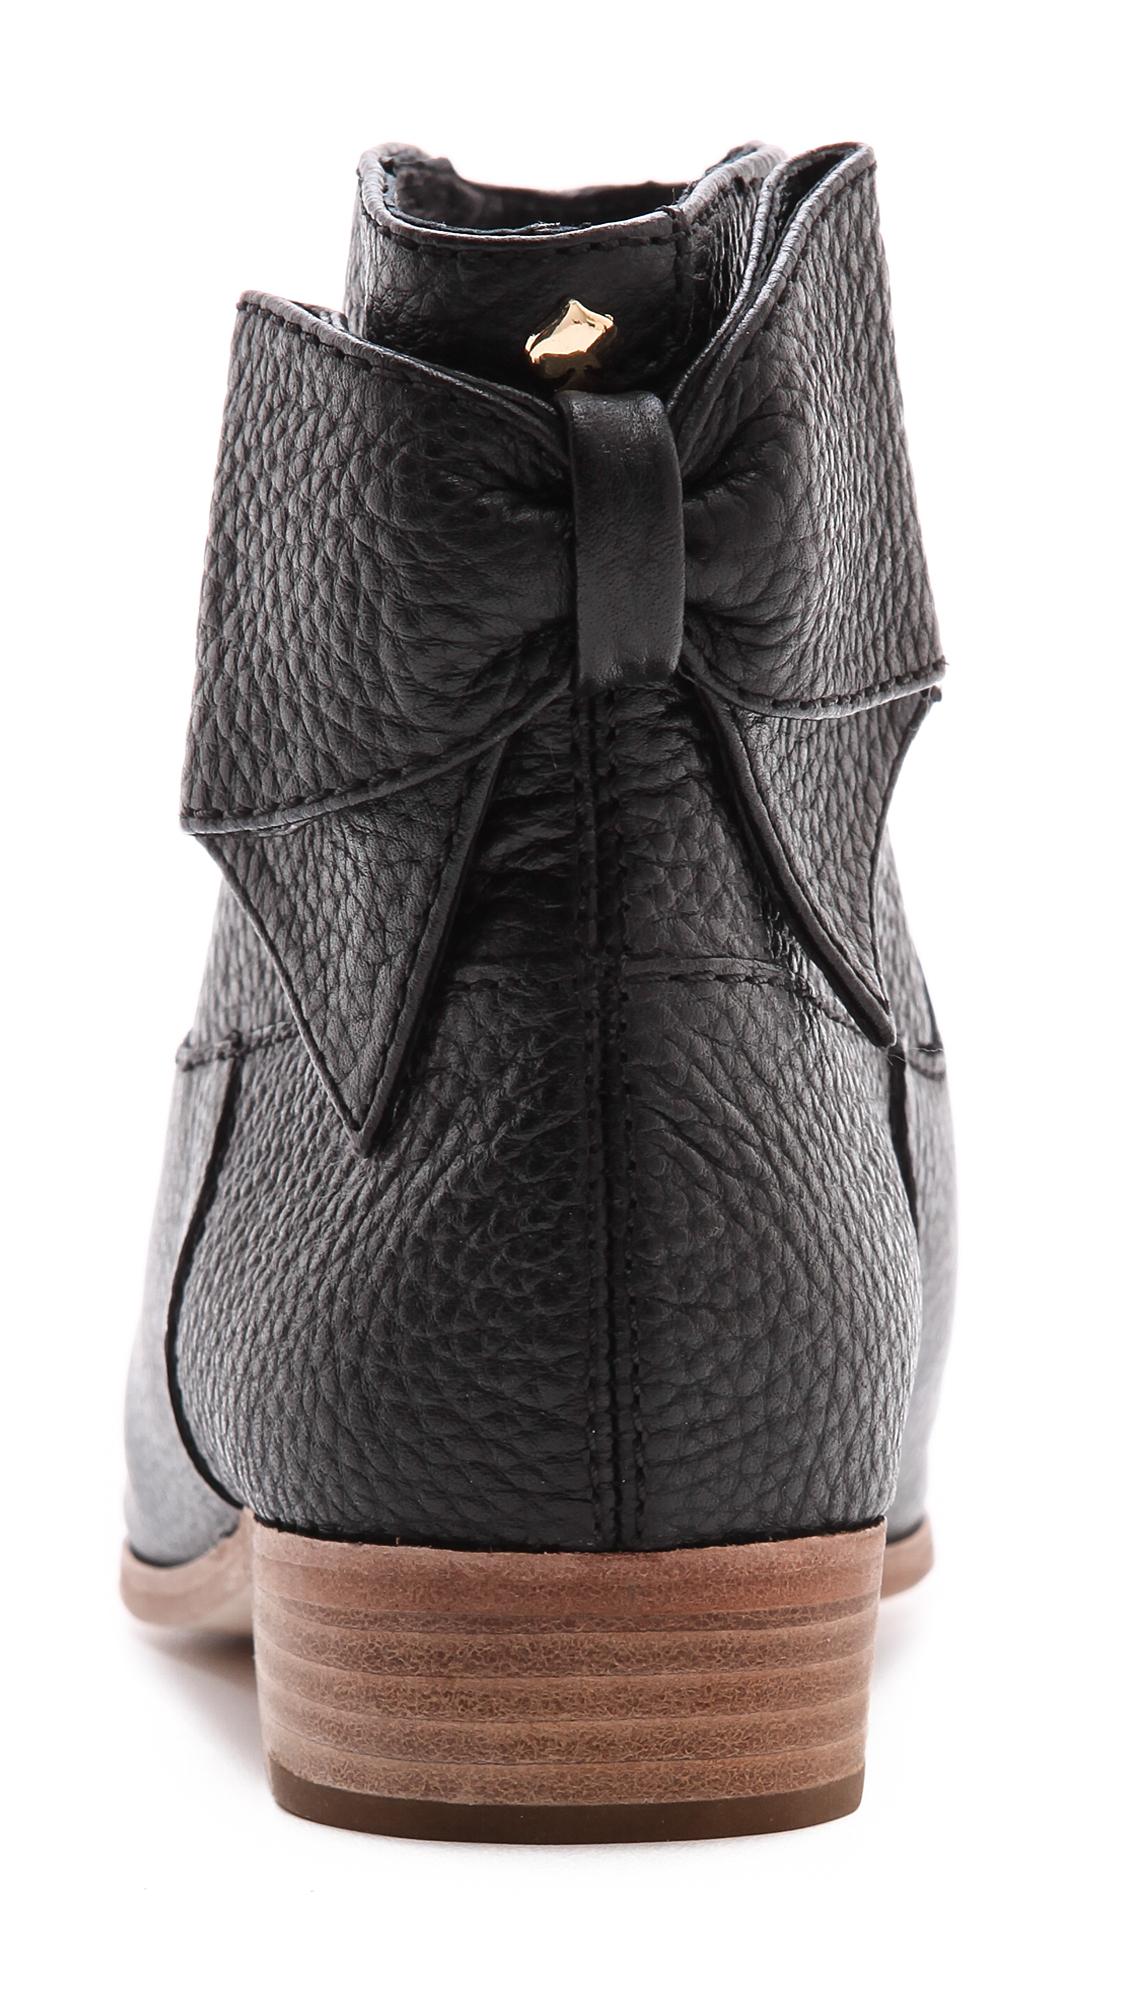 Kate Spade Prospect Flat Bow Booties - Black - Lyst-7428